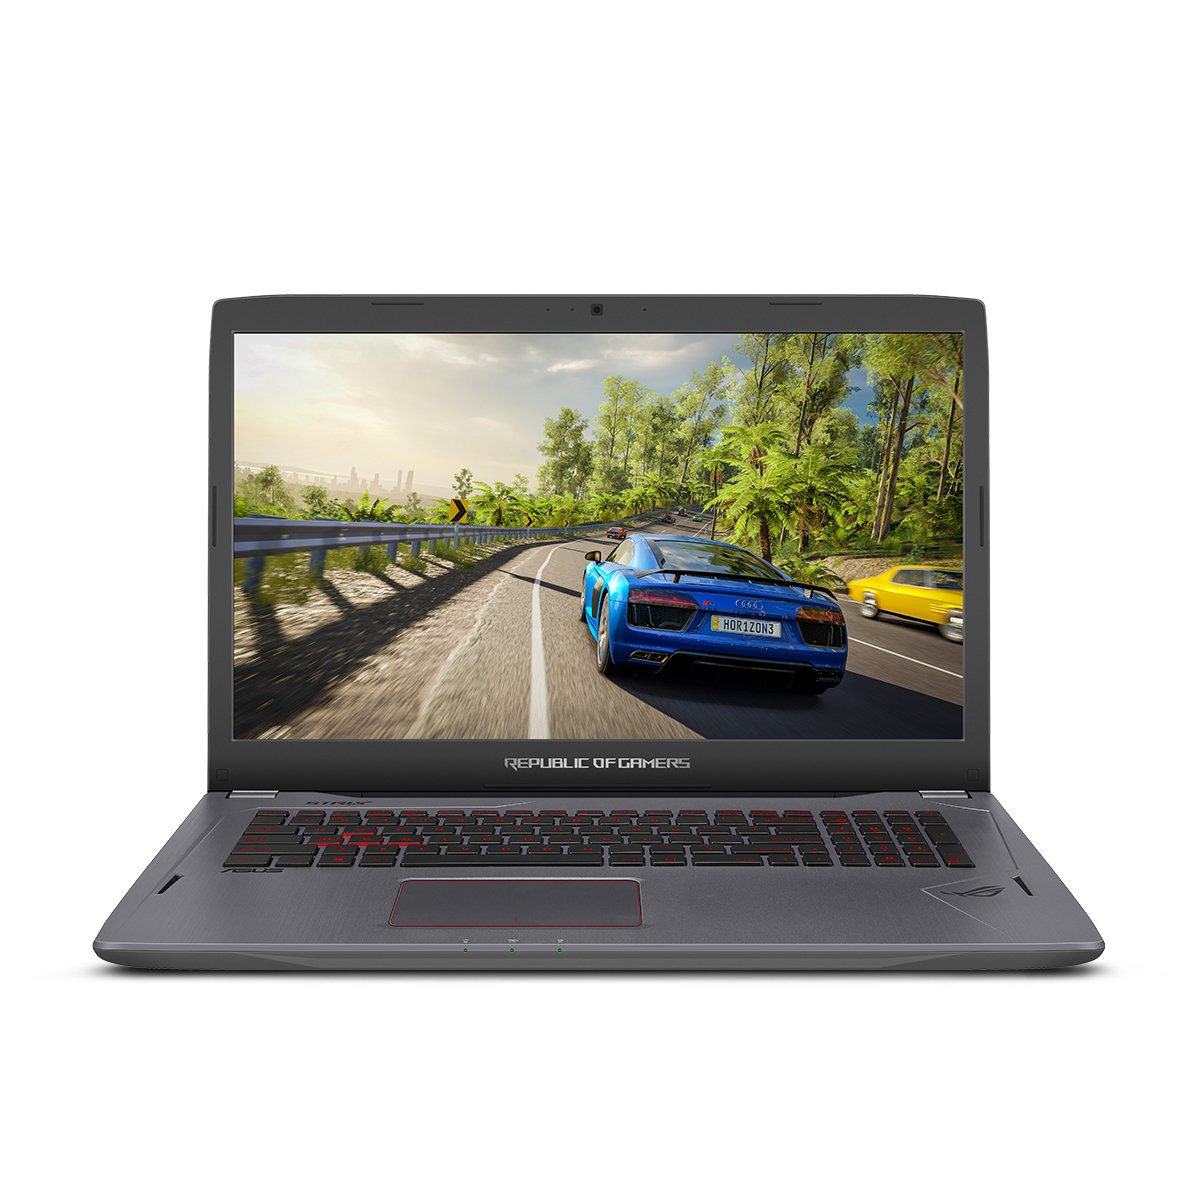 ASUS ROG Strix GL702VS 17.3'' Full HD Ultra Thin and Light Gaming Laptop,75HZ G-SYNC Display, GeForce GTX 1070 8GB, Intel i7-7700HQ 2.8 GHz, 12GB DDR4 RAM, 128GB SSD + 1TB 7200 rpm HDD